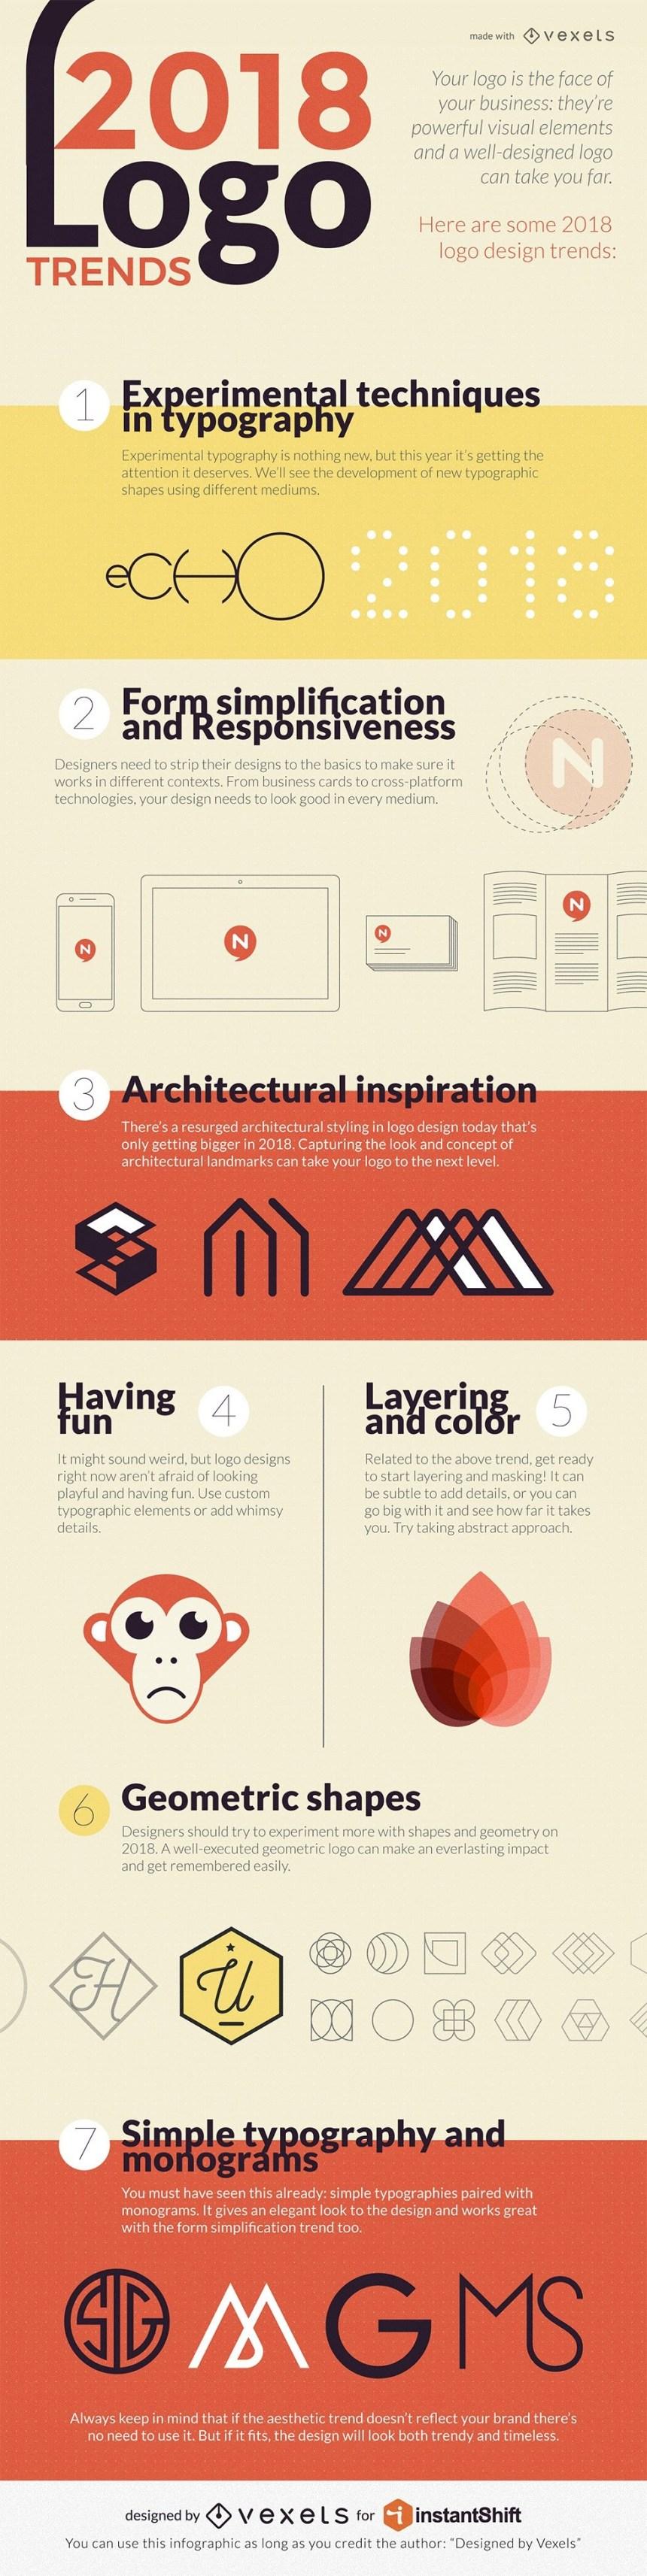 7 tendencias en diseño de logos